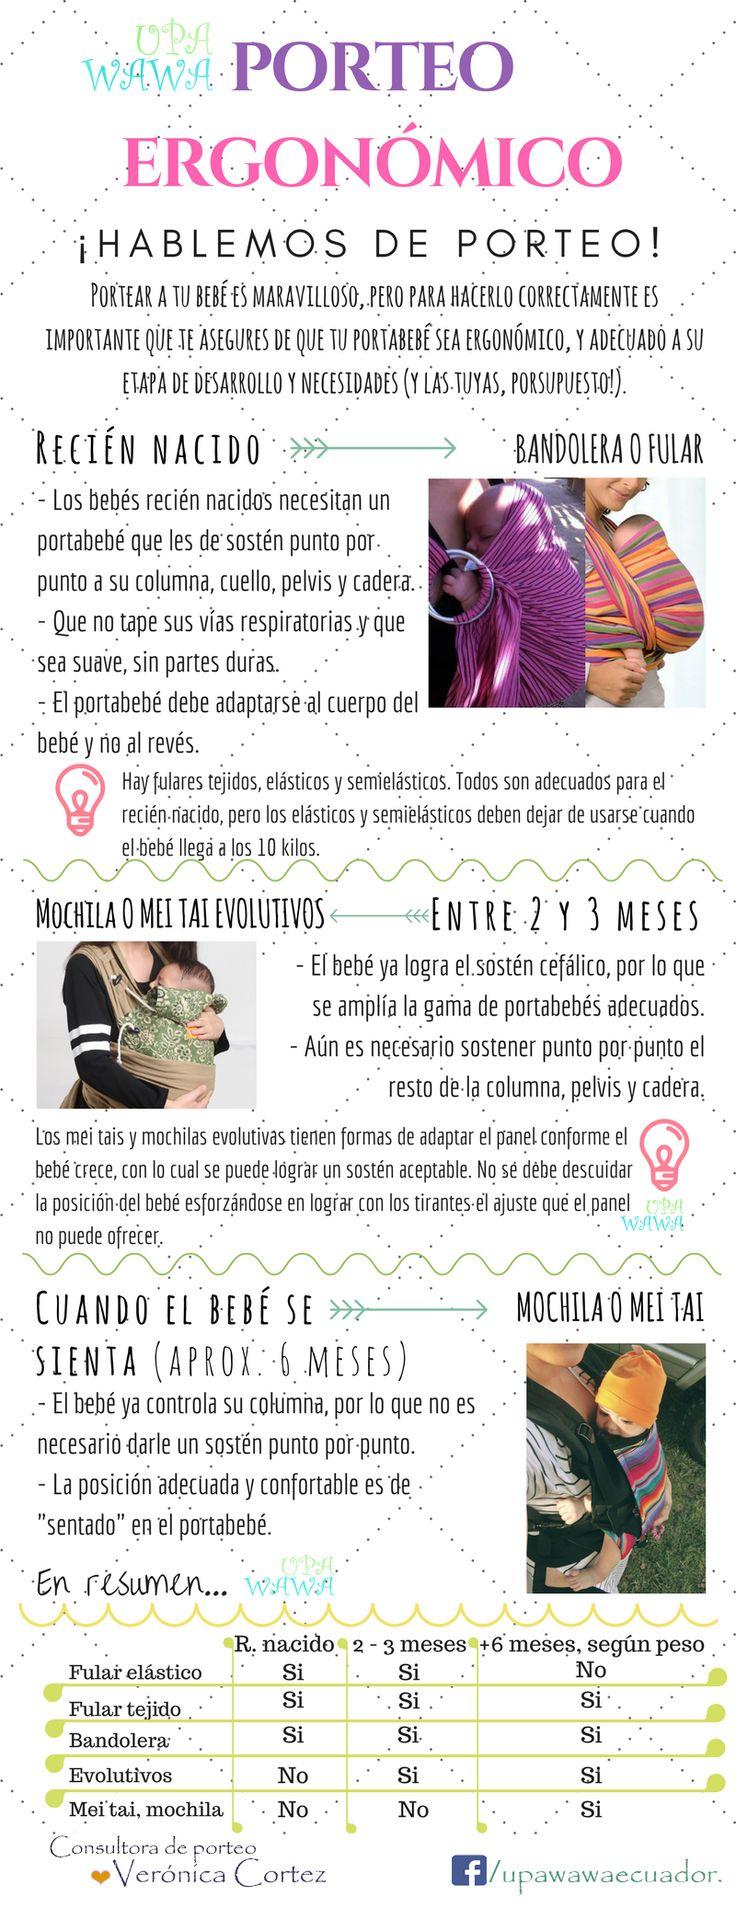 #upawawa, #fular, #portabebes, #ergonomicos, #bandolera, #mochila, #meitai, #porteo, #bebe, #reciennacido